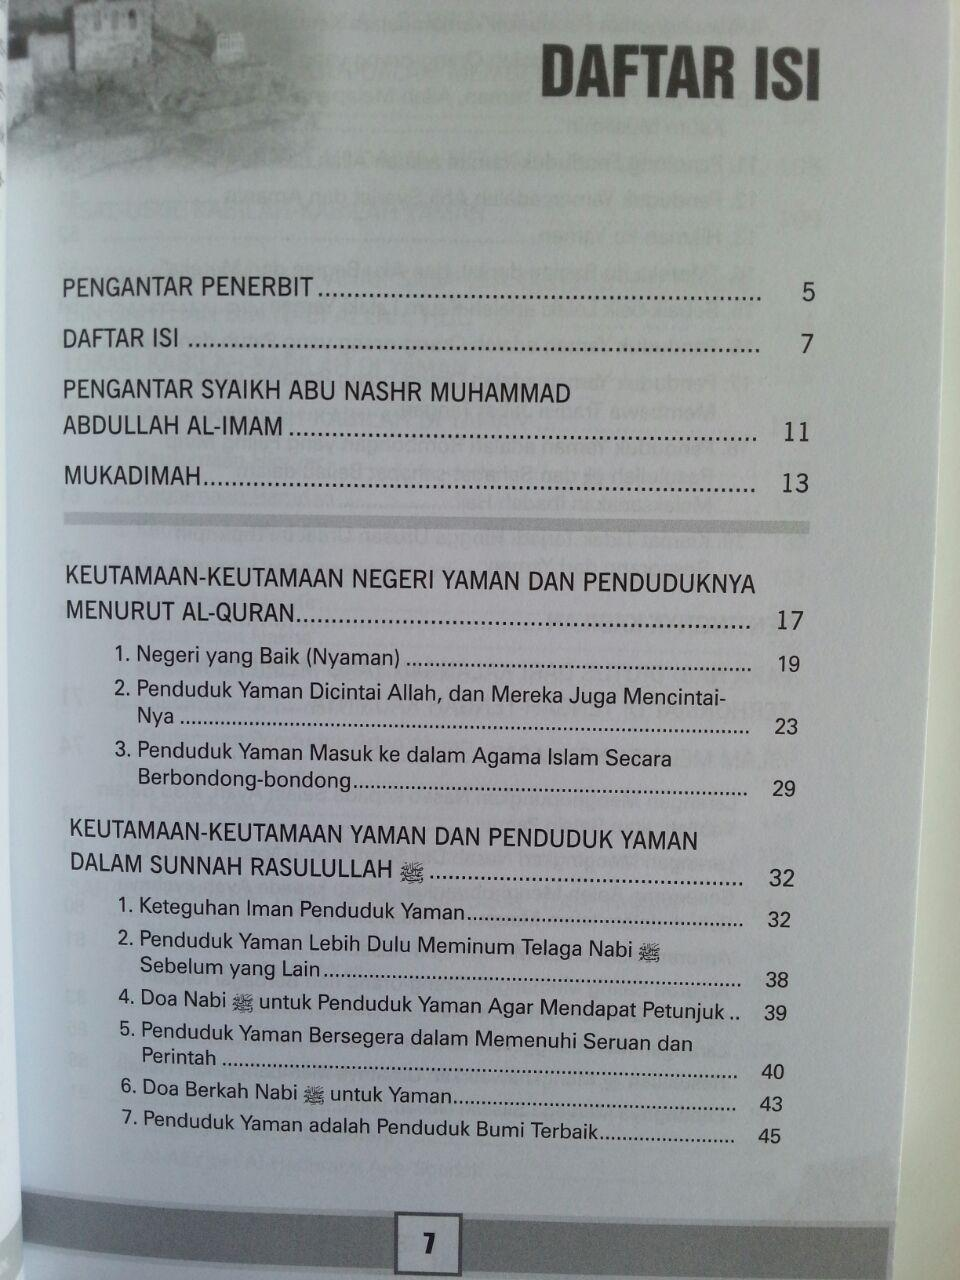 Buku Karomah Negeri Yaman Keistimewaan Yaman Dan Penduduknya isi 2